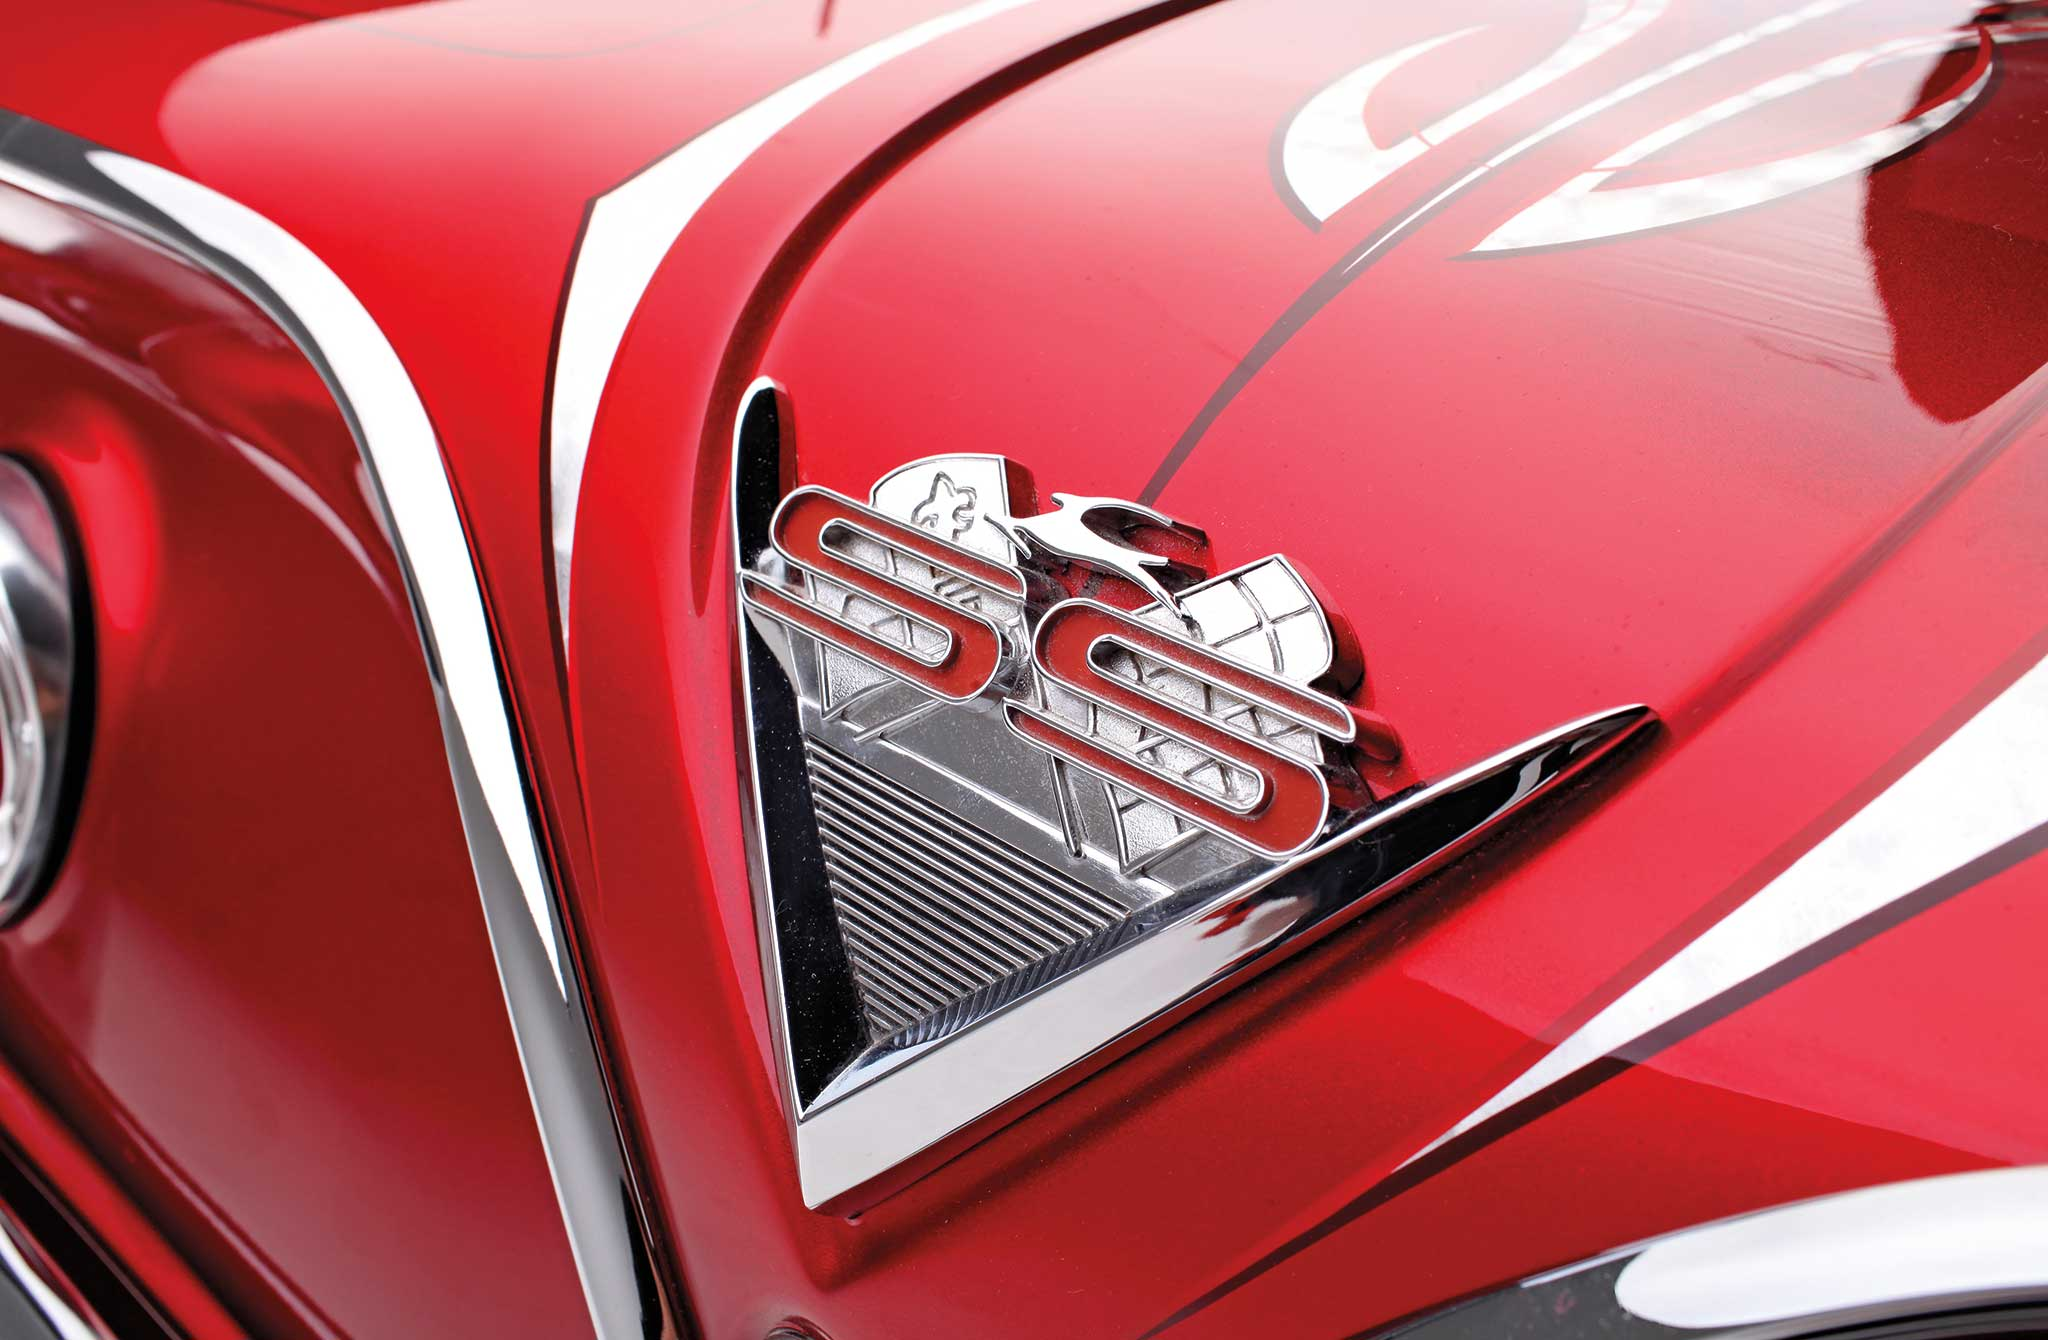 006 1961 chevrolet impala convertible ss trunk badge